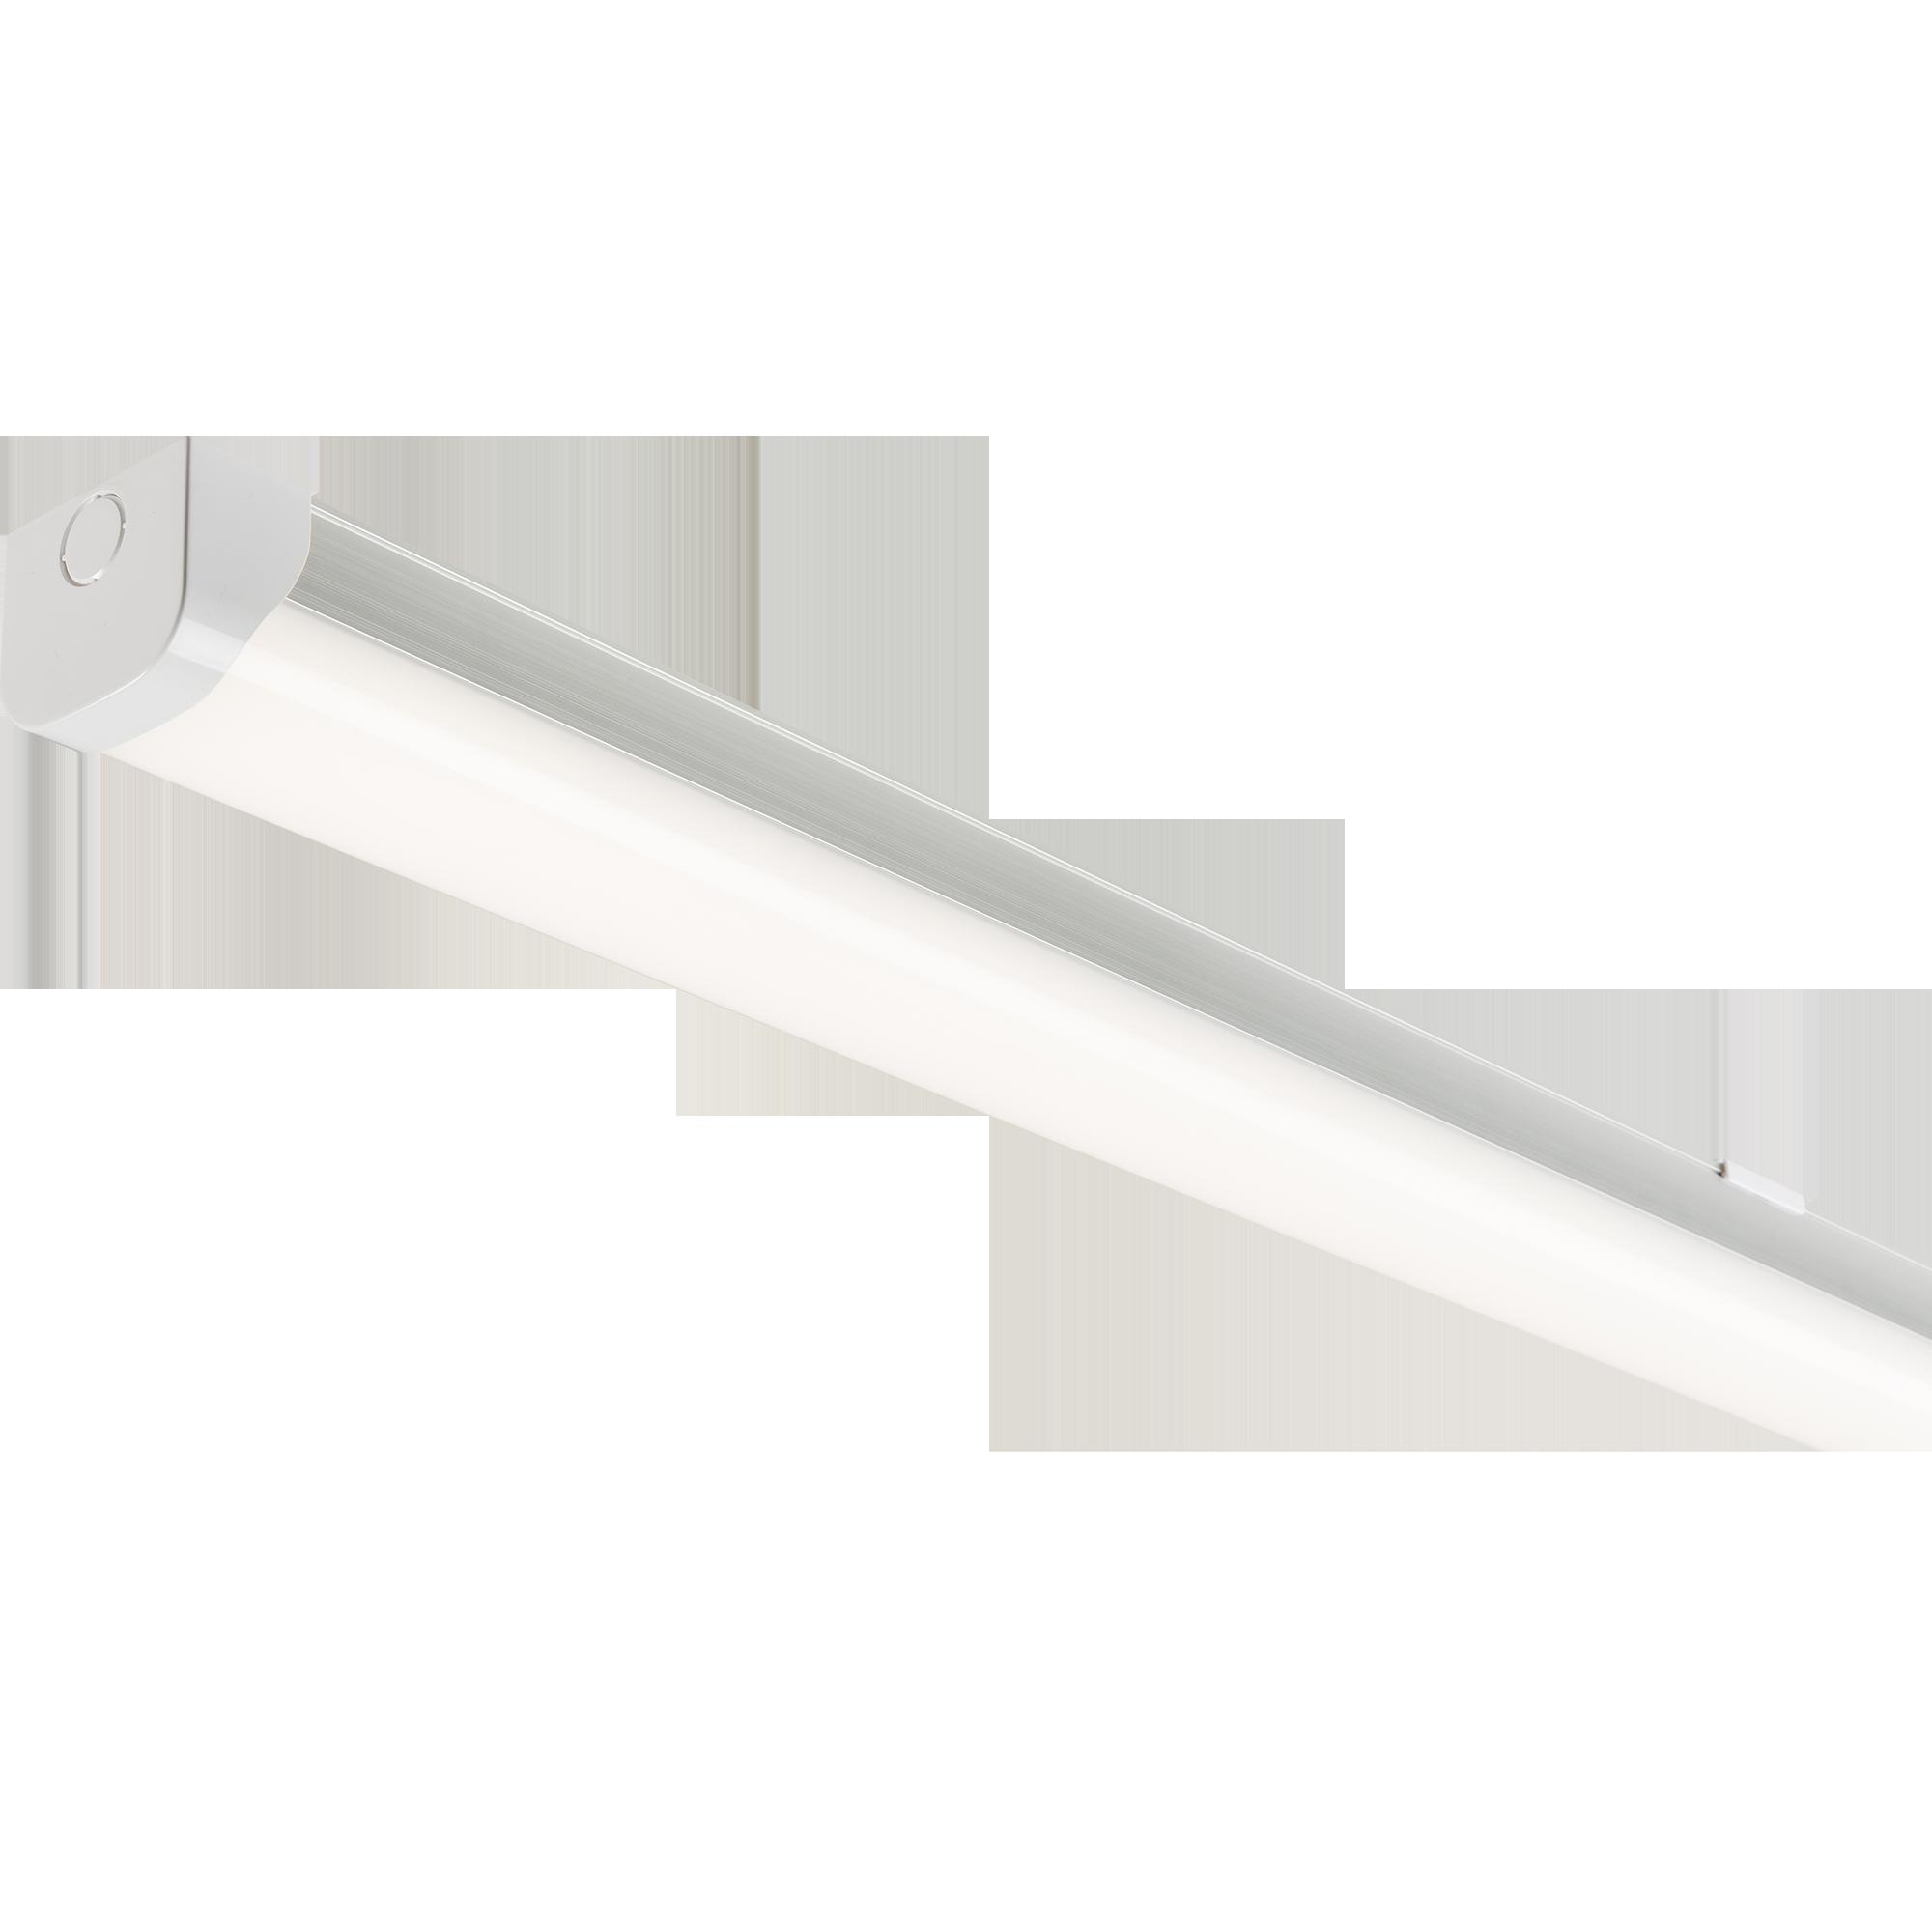 Knightsbridge LEDBATW44 230V 44W 1500mm (5ft) LED Batten